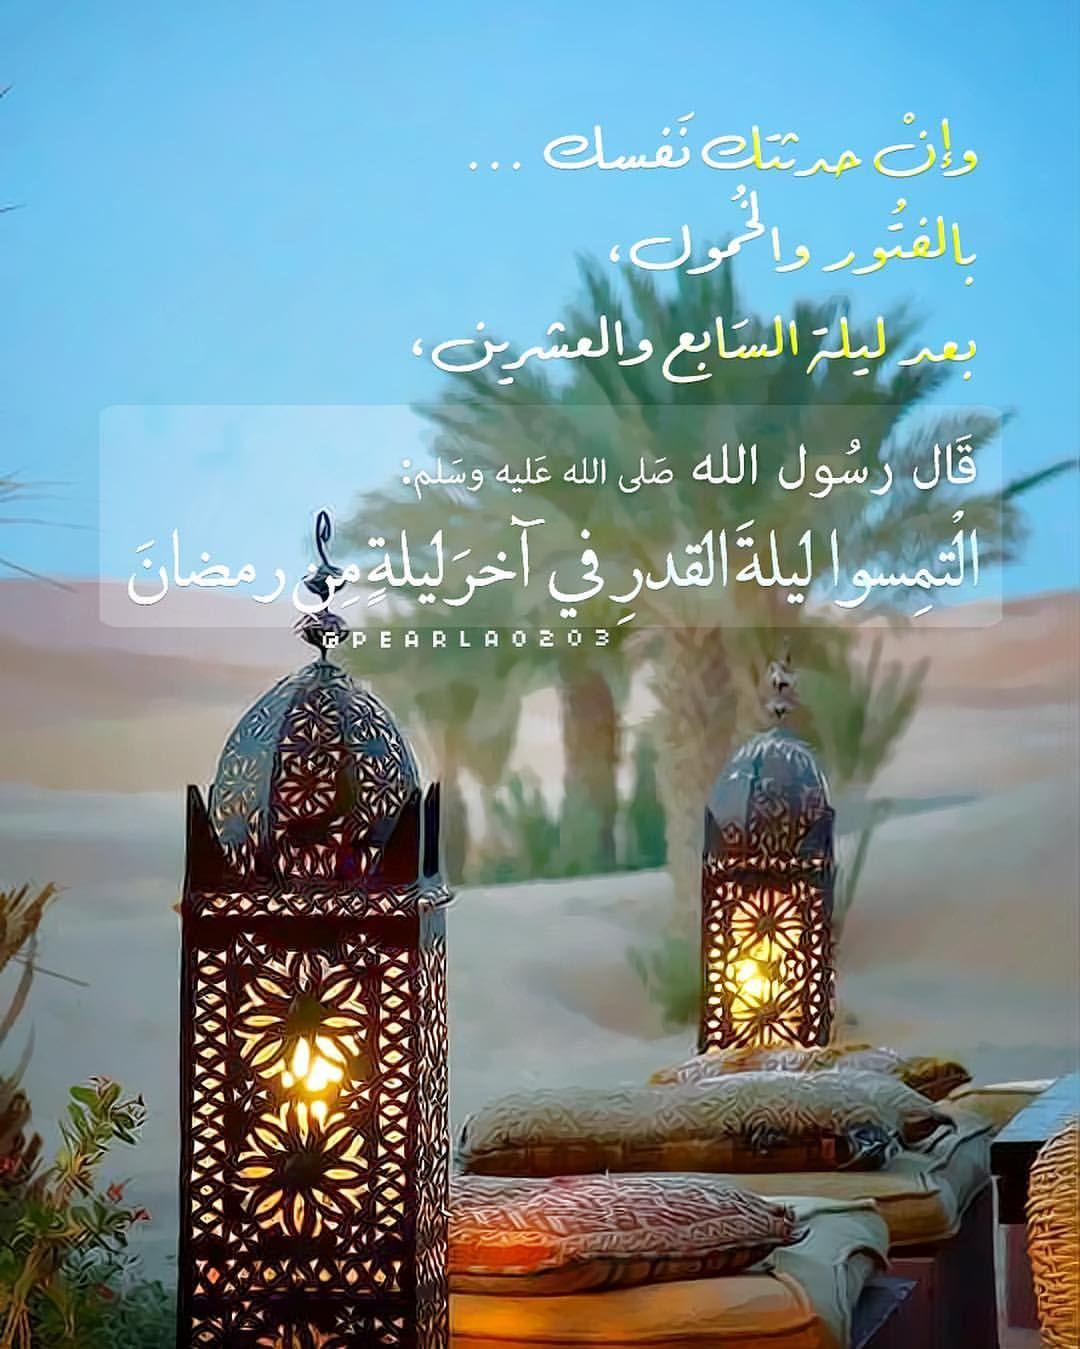 Instagram Photo By Pearla0203 Jul 3 2016 At 1 19pm Utc Ramadan Kareem Ramadan Instagram Posts